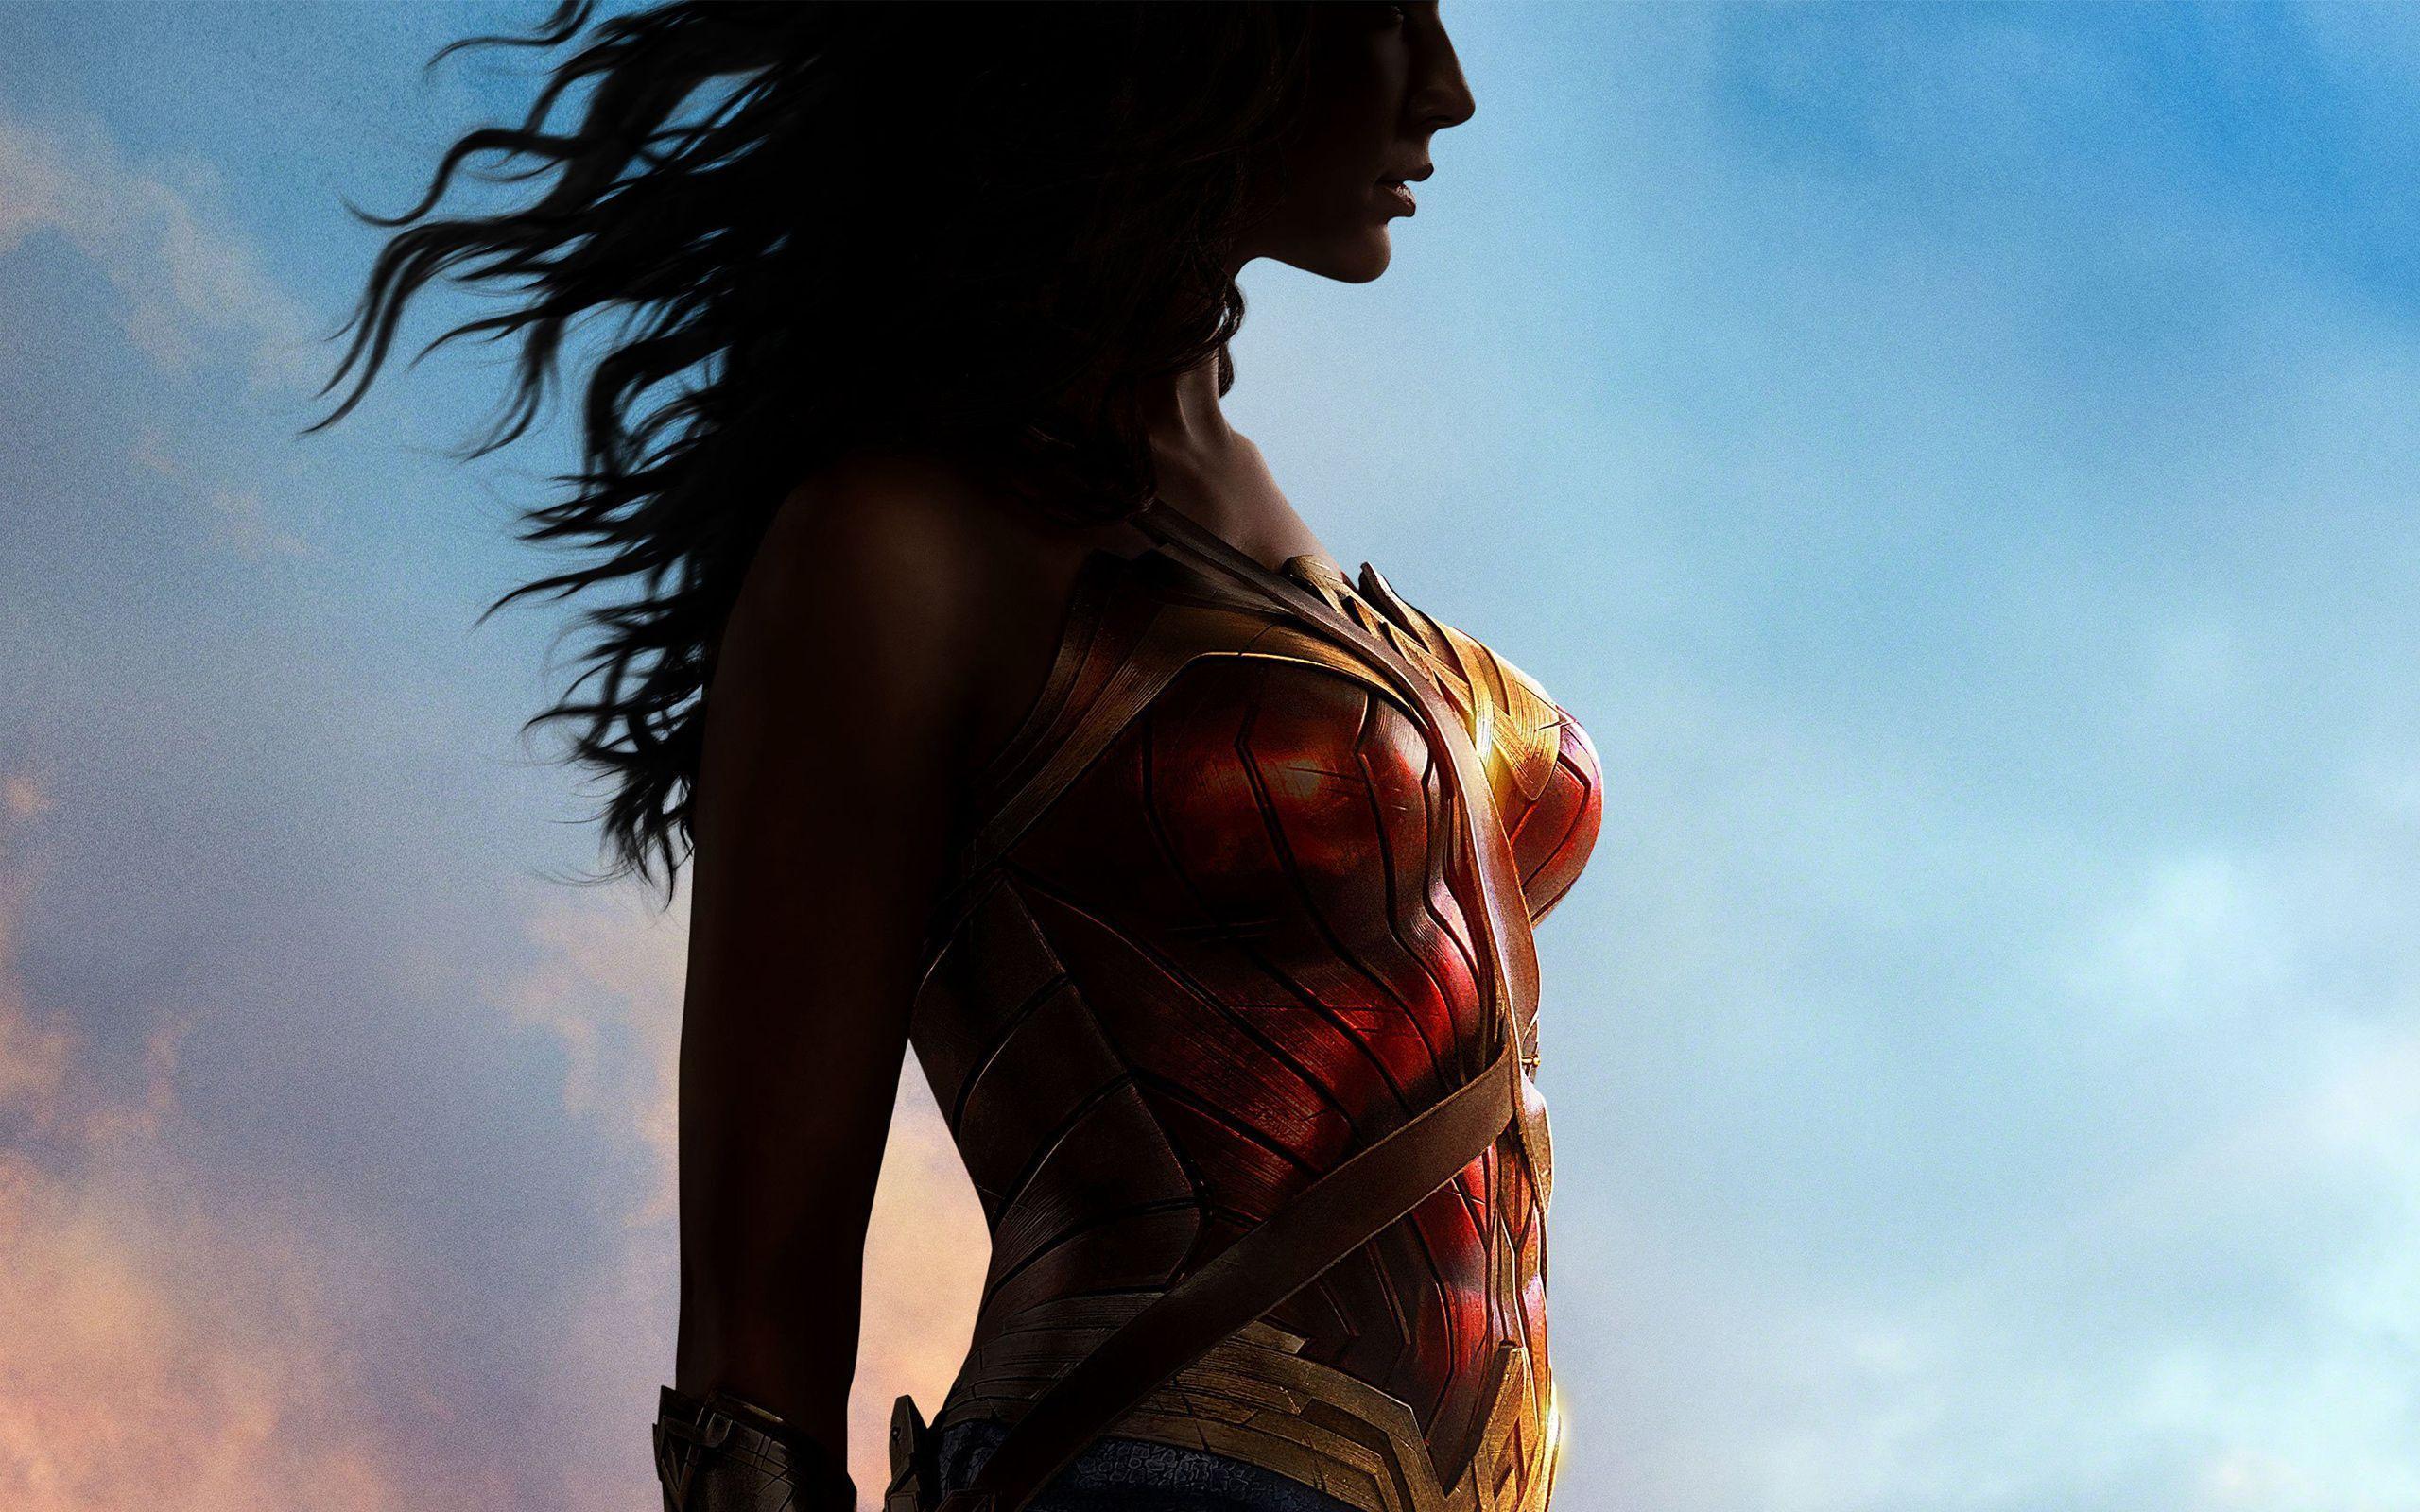 Wonder Woman Movie Wallpaper 1